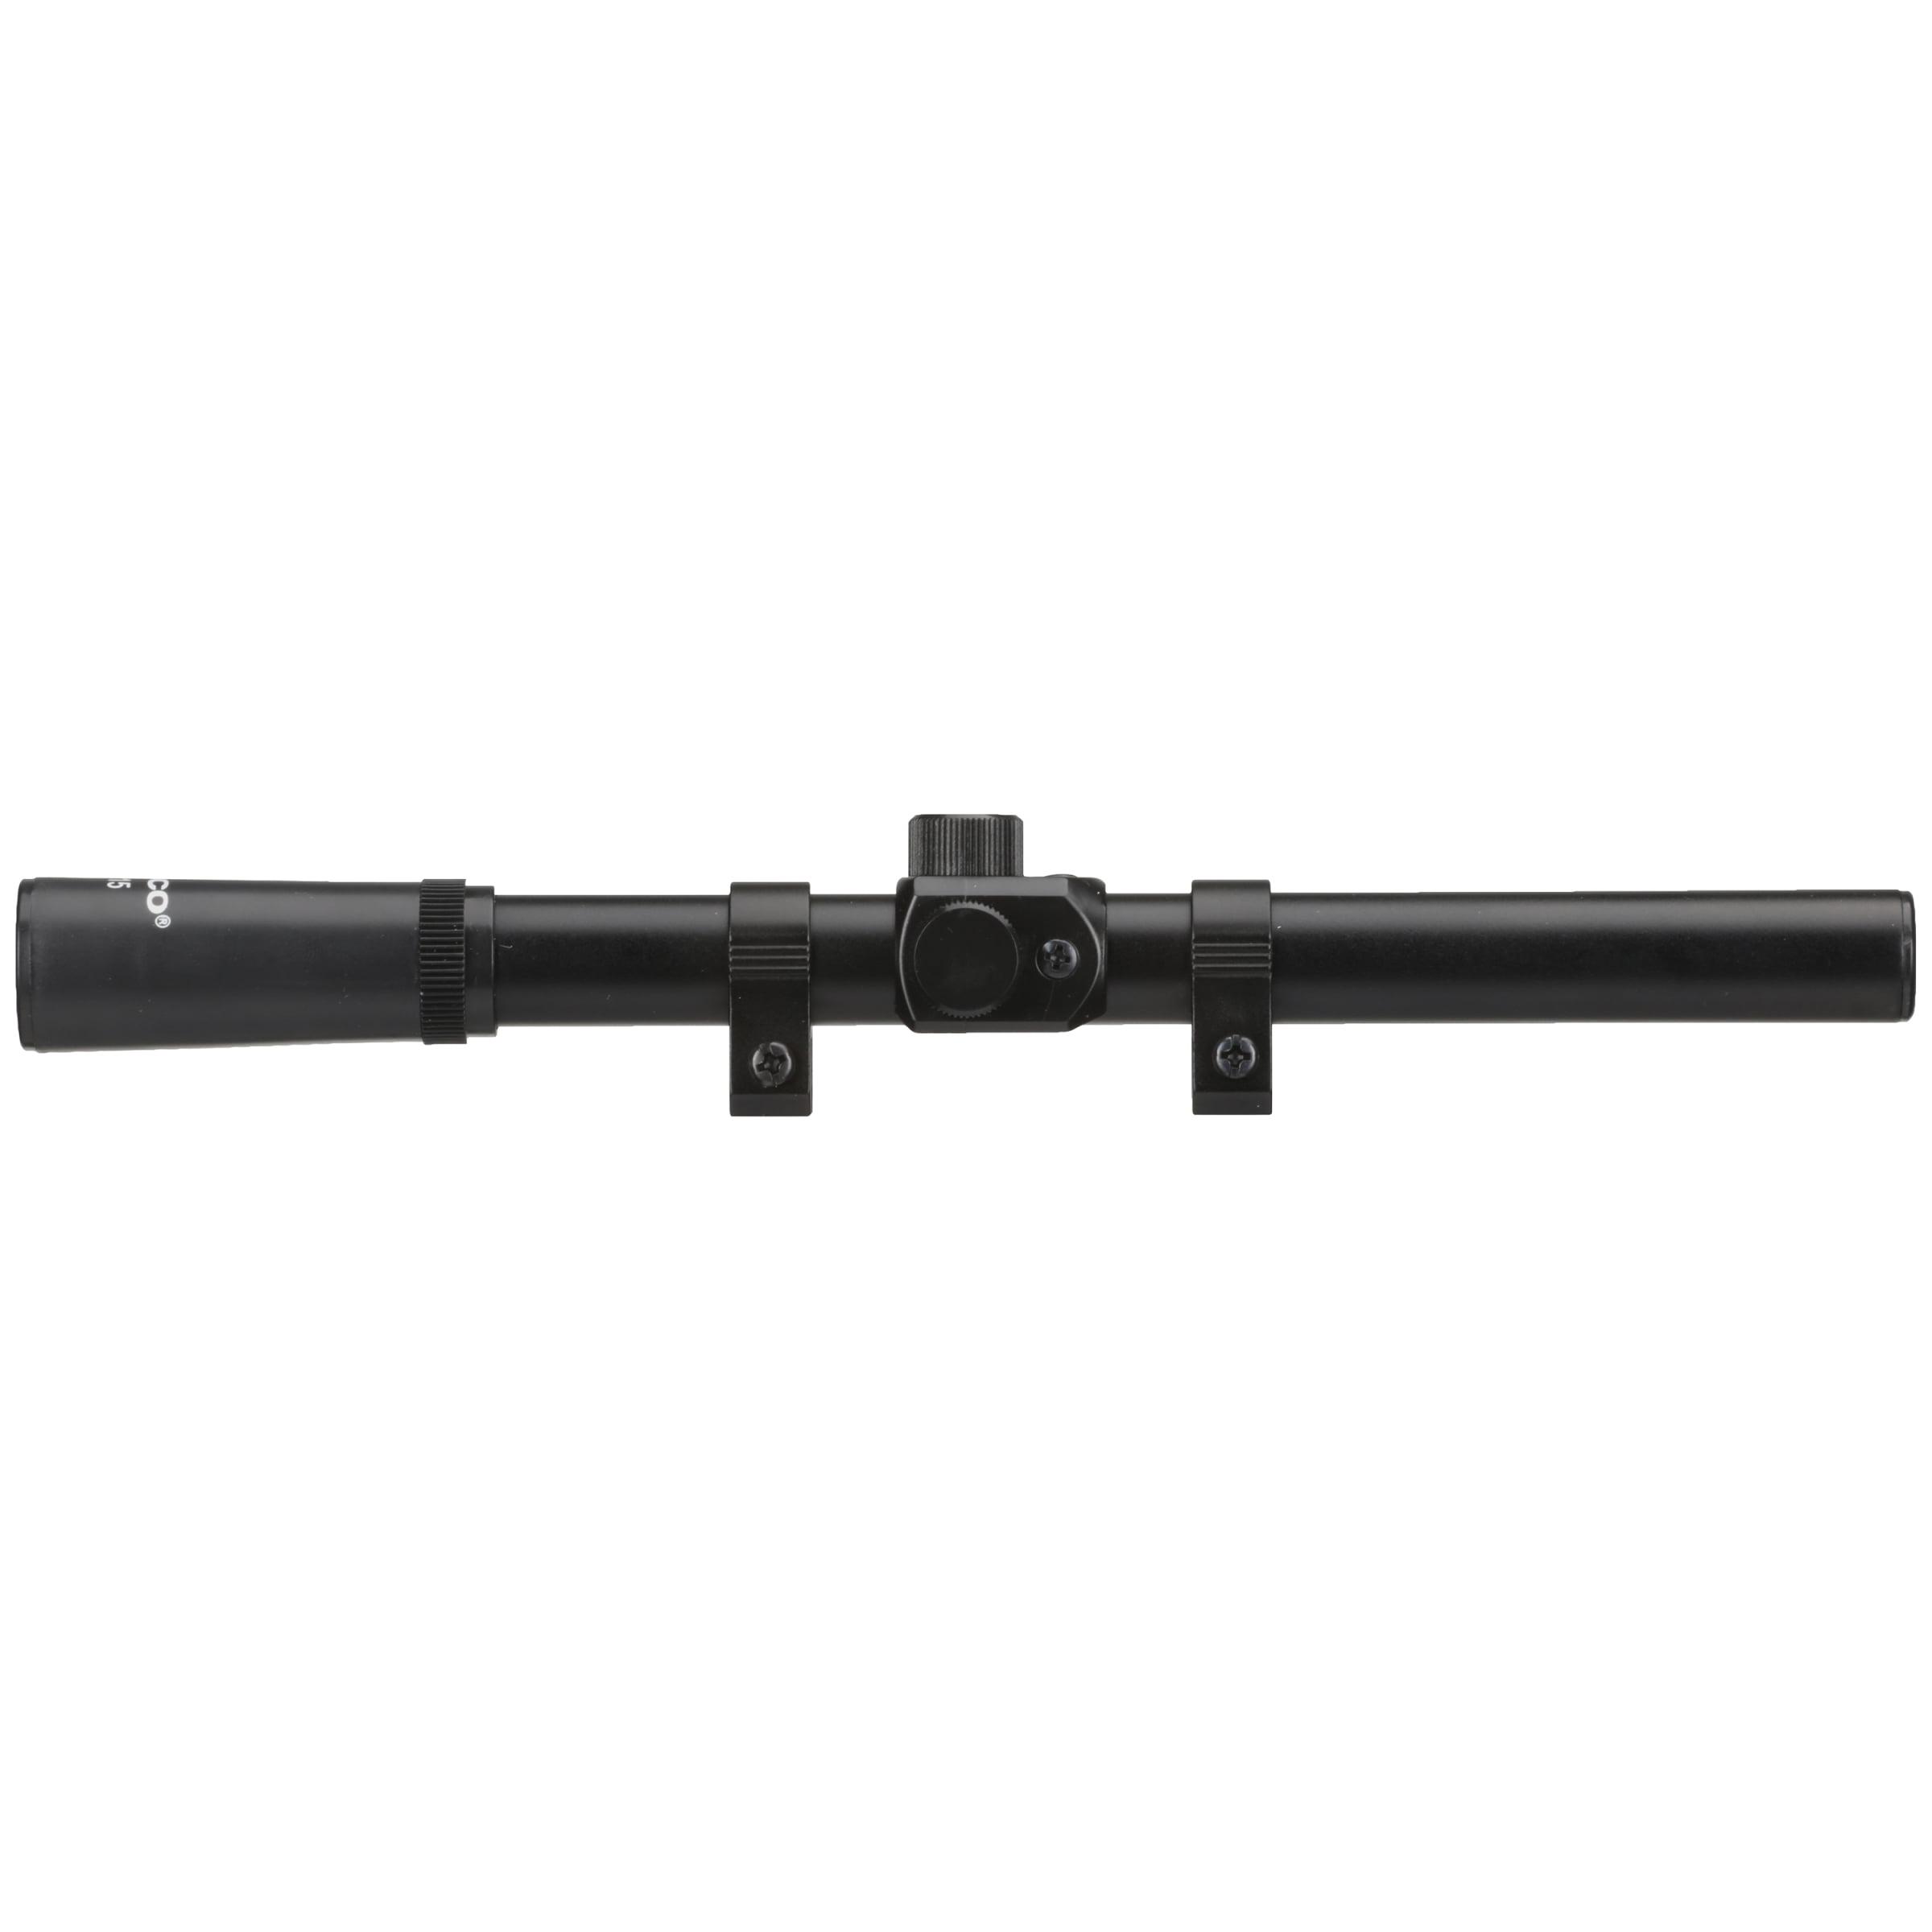 Tasco RF4X15 Rifle Scope with Rings /& Lens Caps